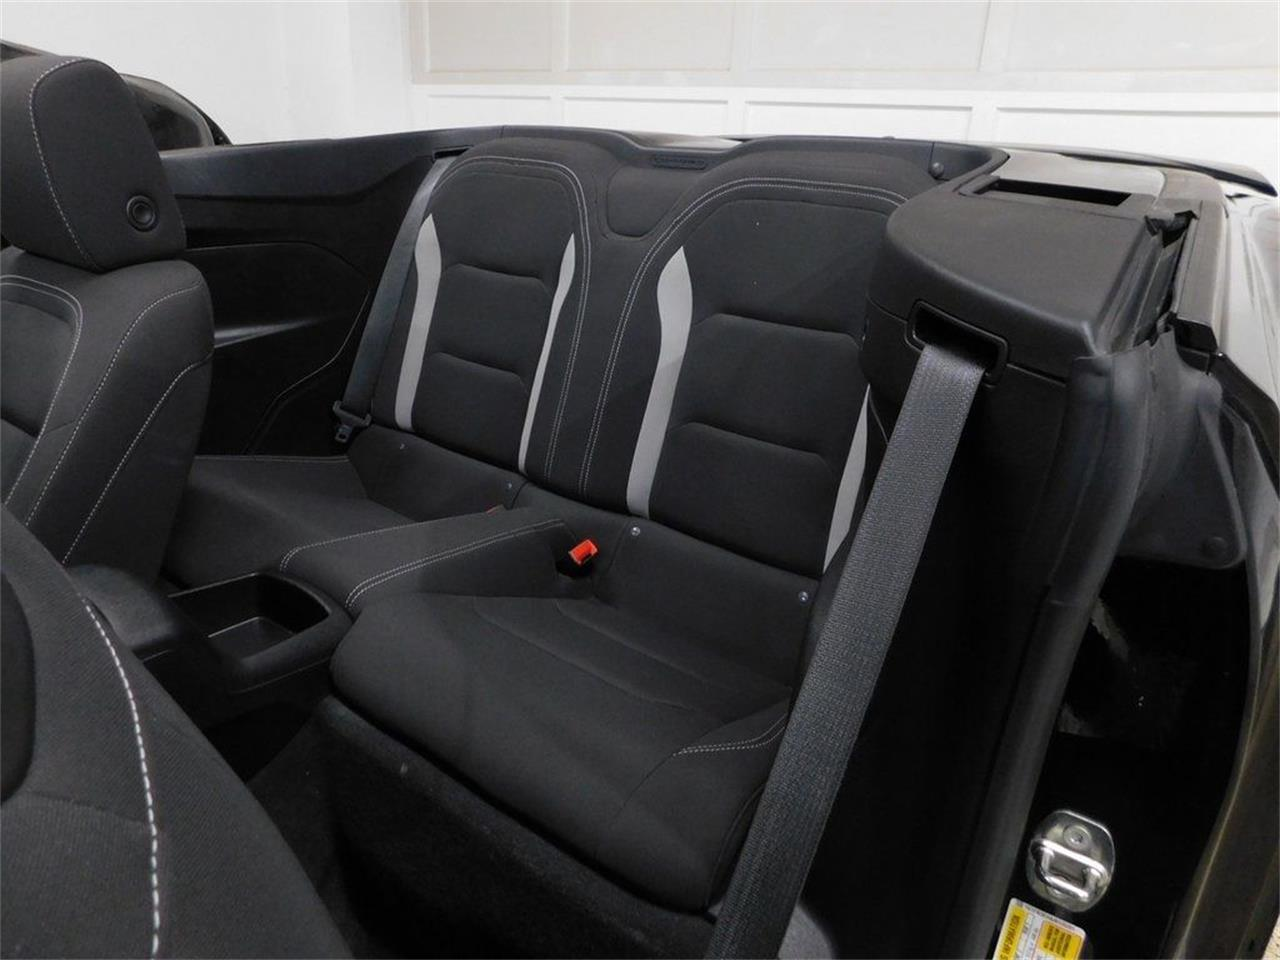 2018 Chevrolet Camaro (CC-1417492) for sale in Hamburg, New York